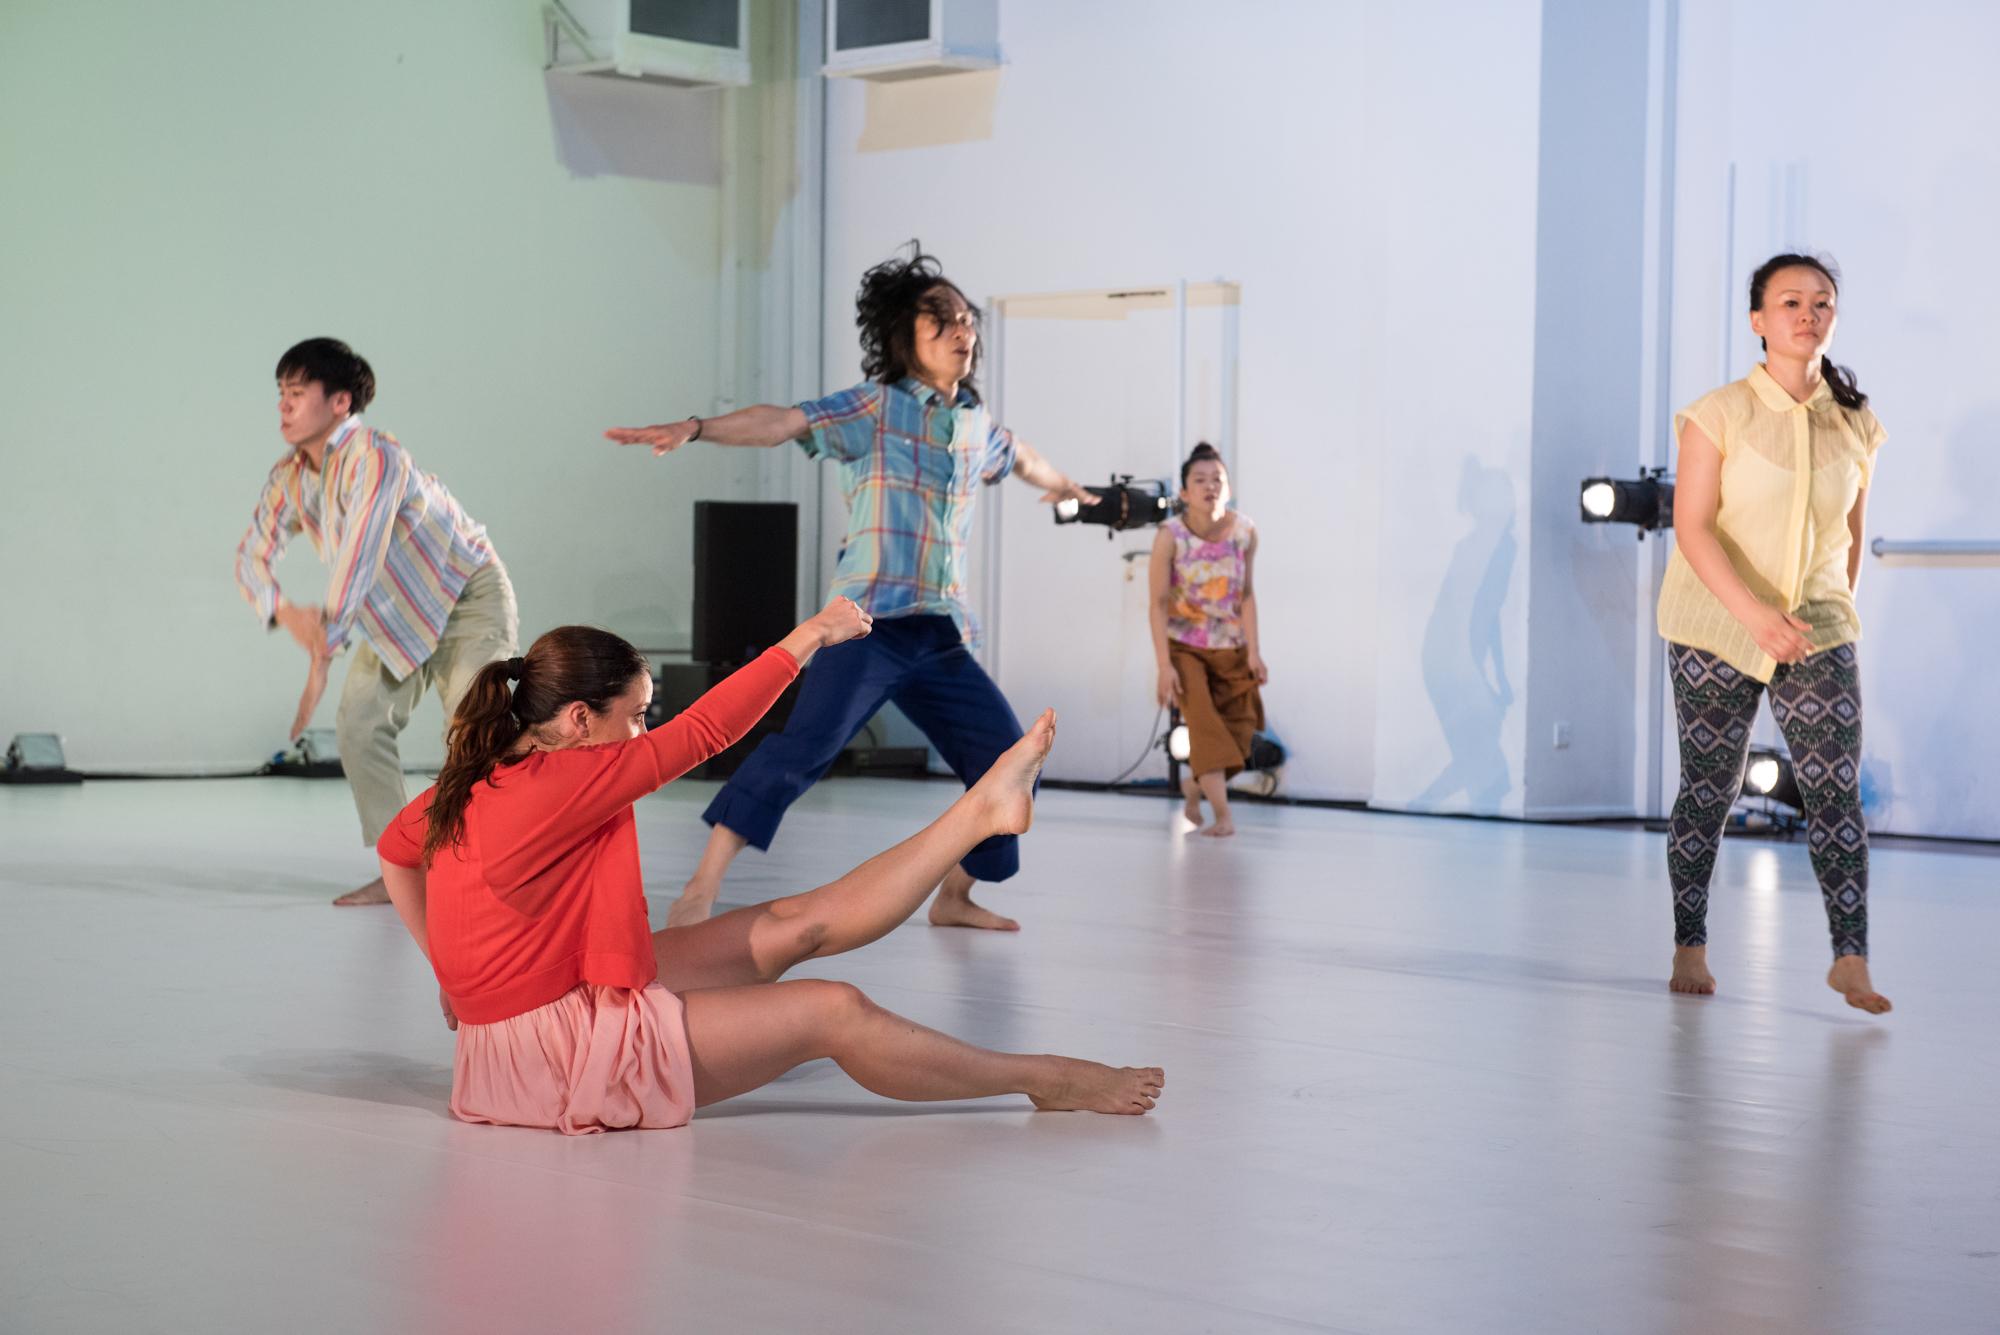 『RE/PLAY Dance Edit』シンガポール公演 Photo by LAW Kian Yan